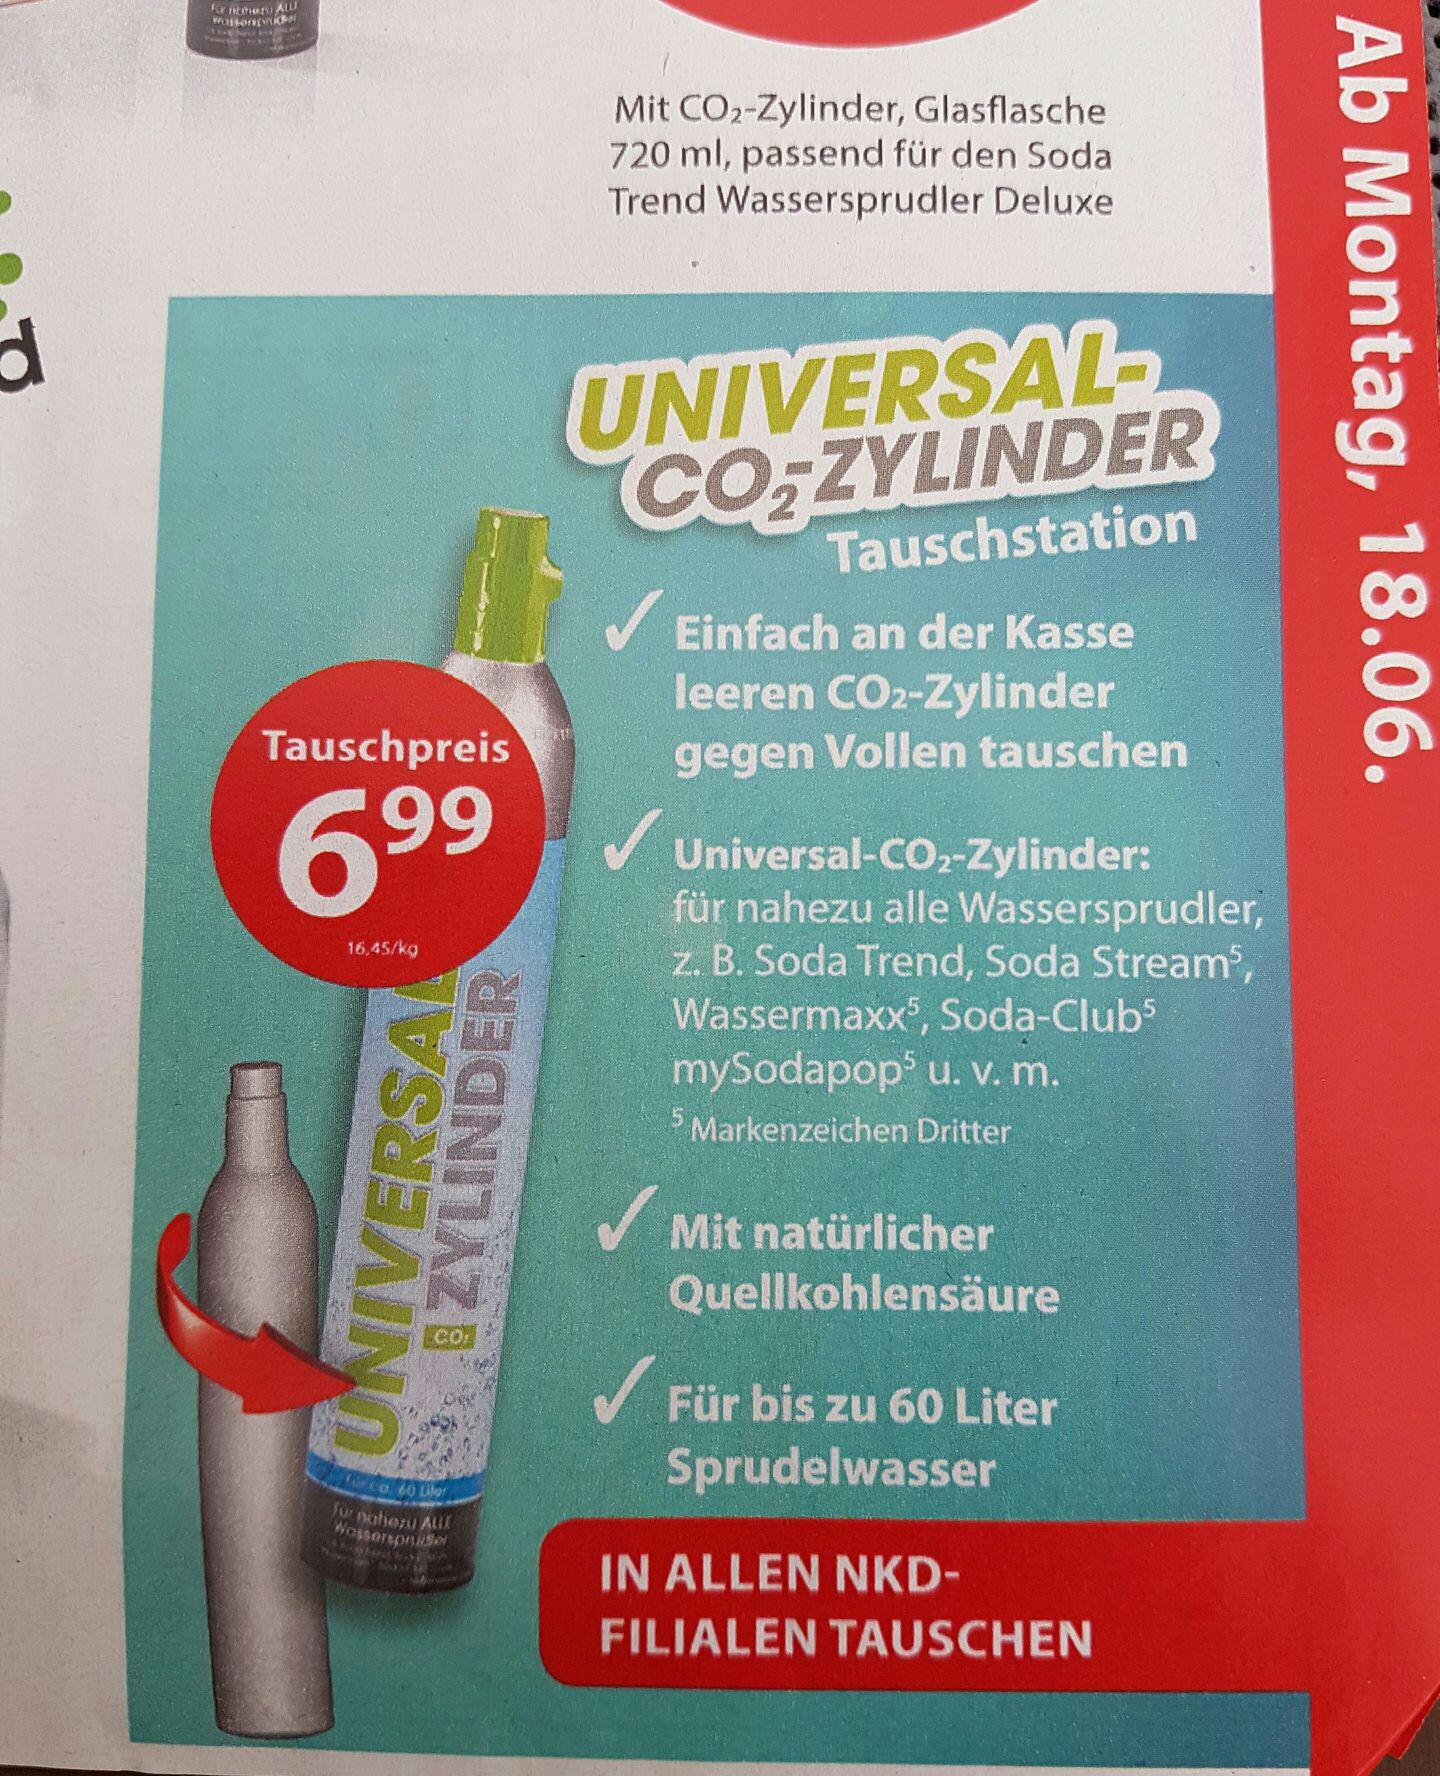 [NKD] Universal CO2-Zylinder (im Tausch) z.B. Sodastream, Wassermaxxx